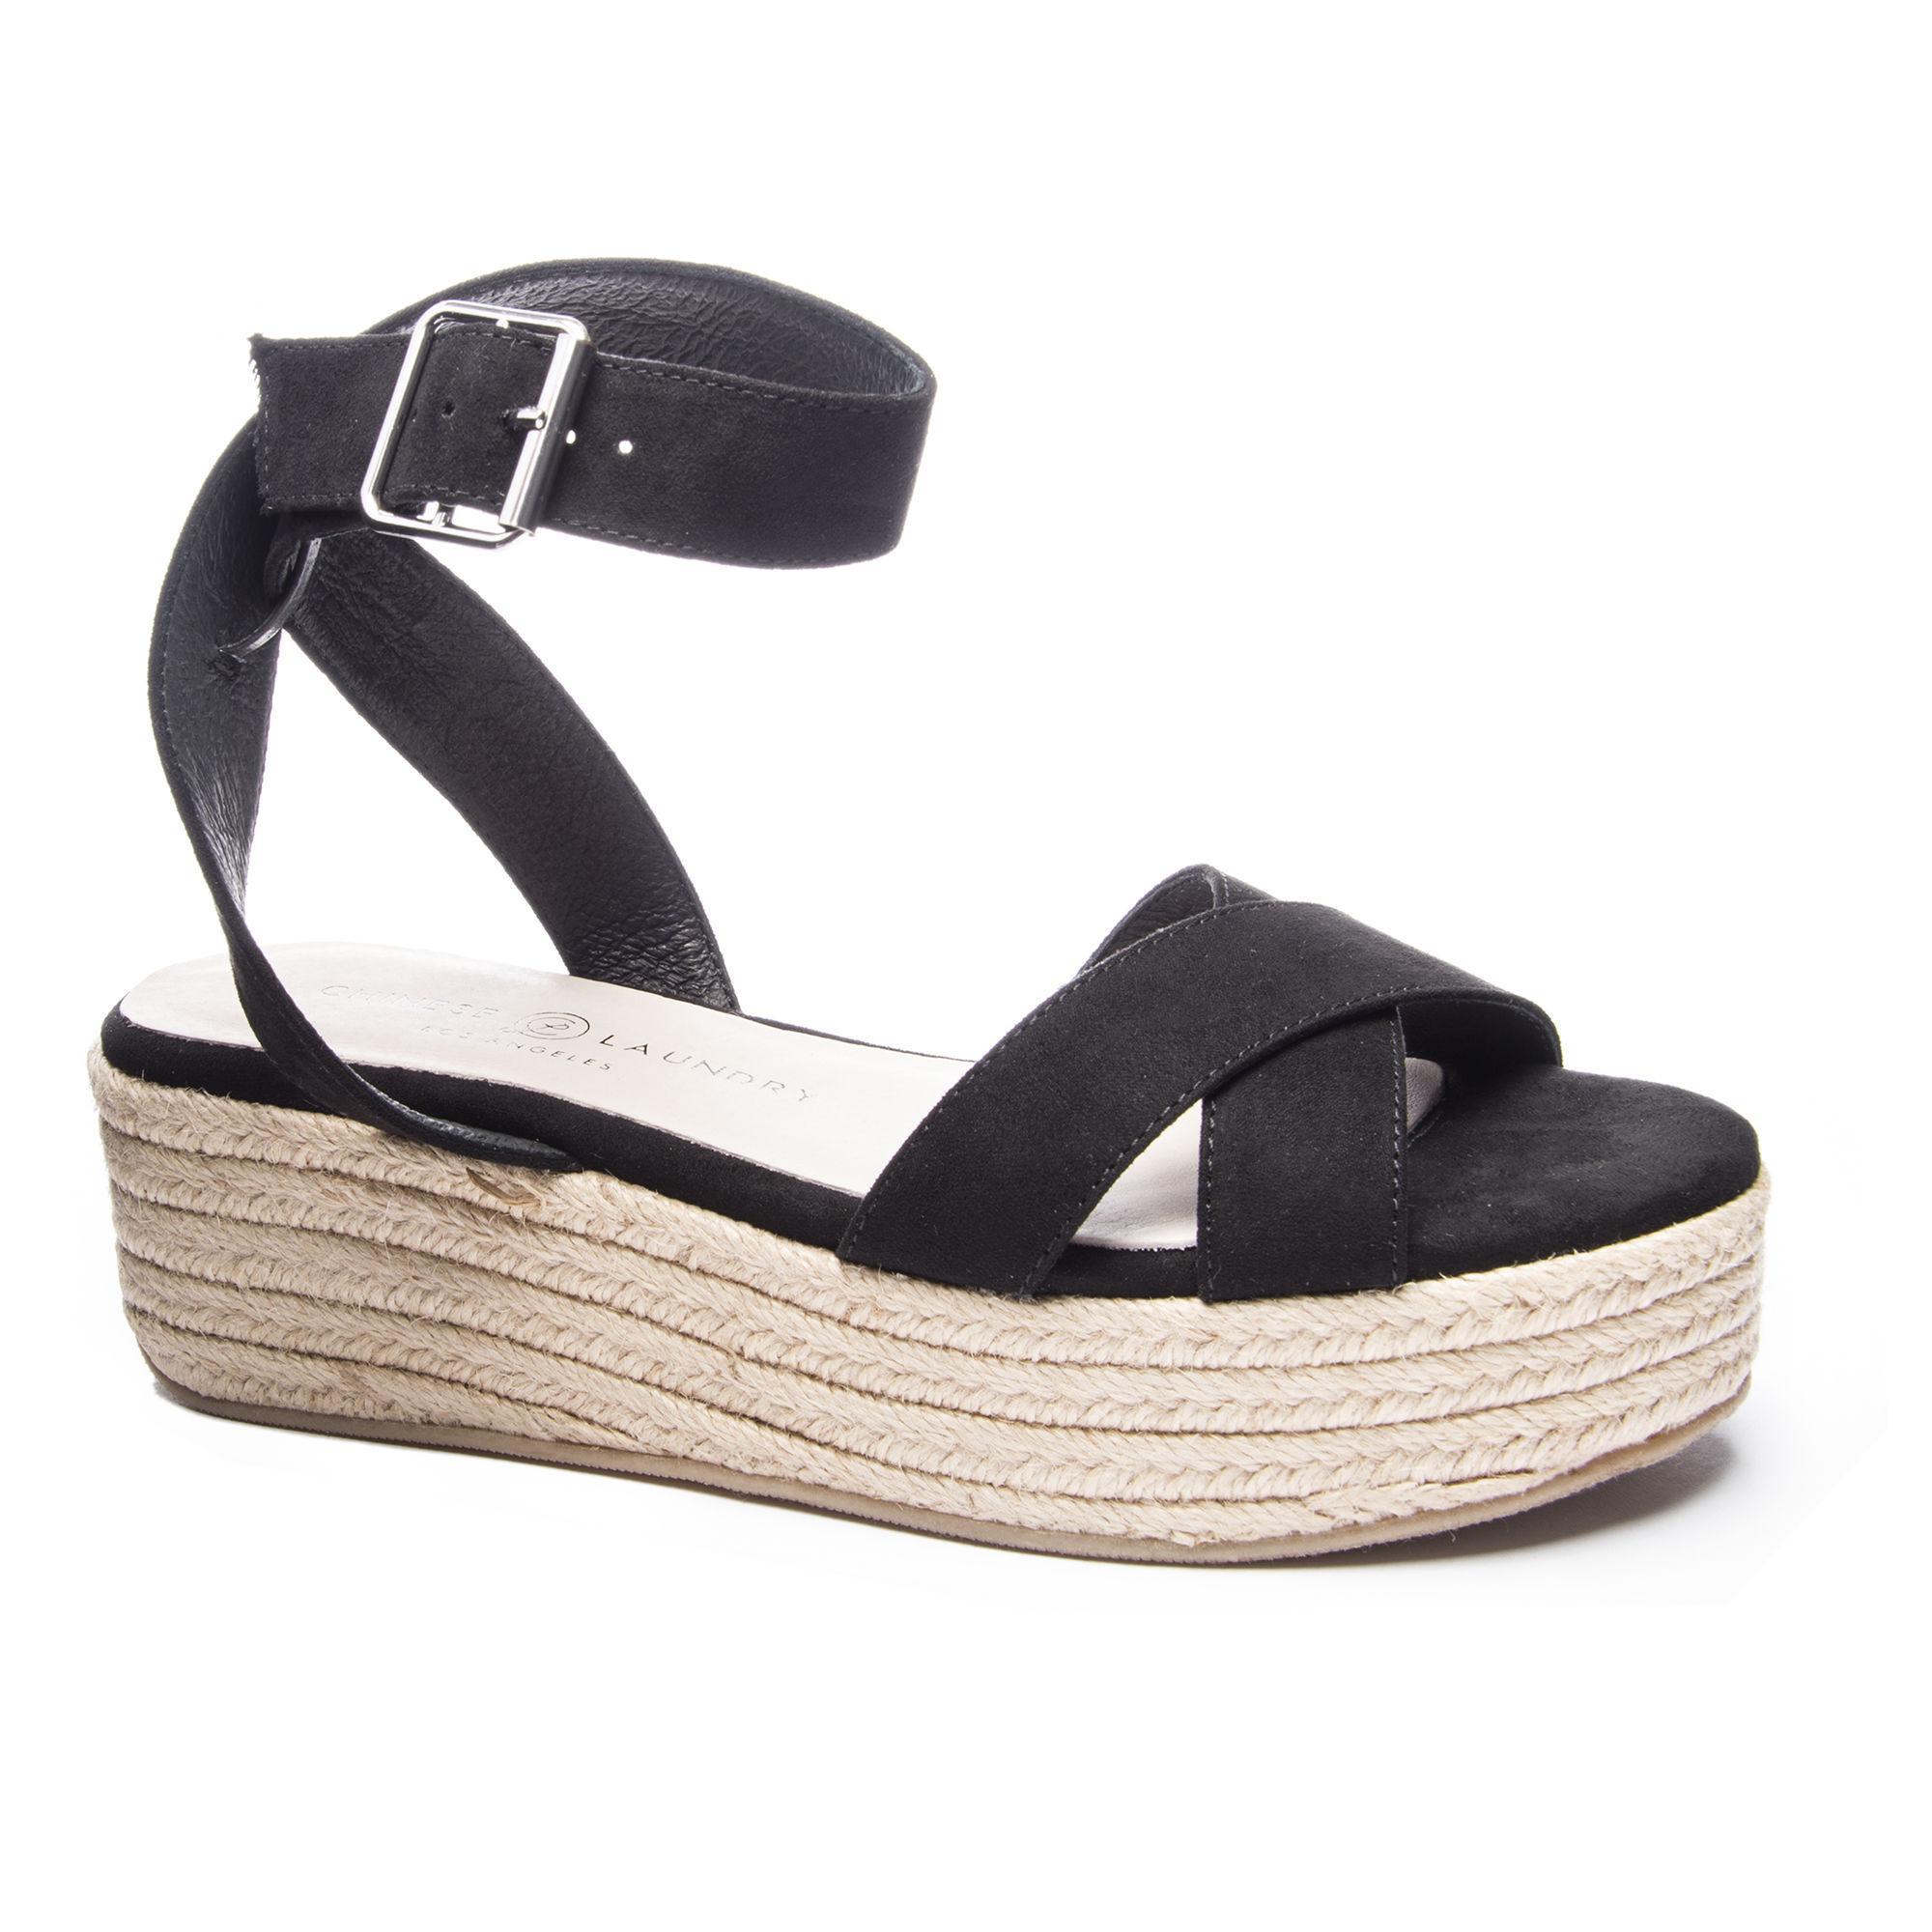 2148ed76ba2e Lyst - Chinese Laundry Zala Wedge Sandal in Black